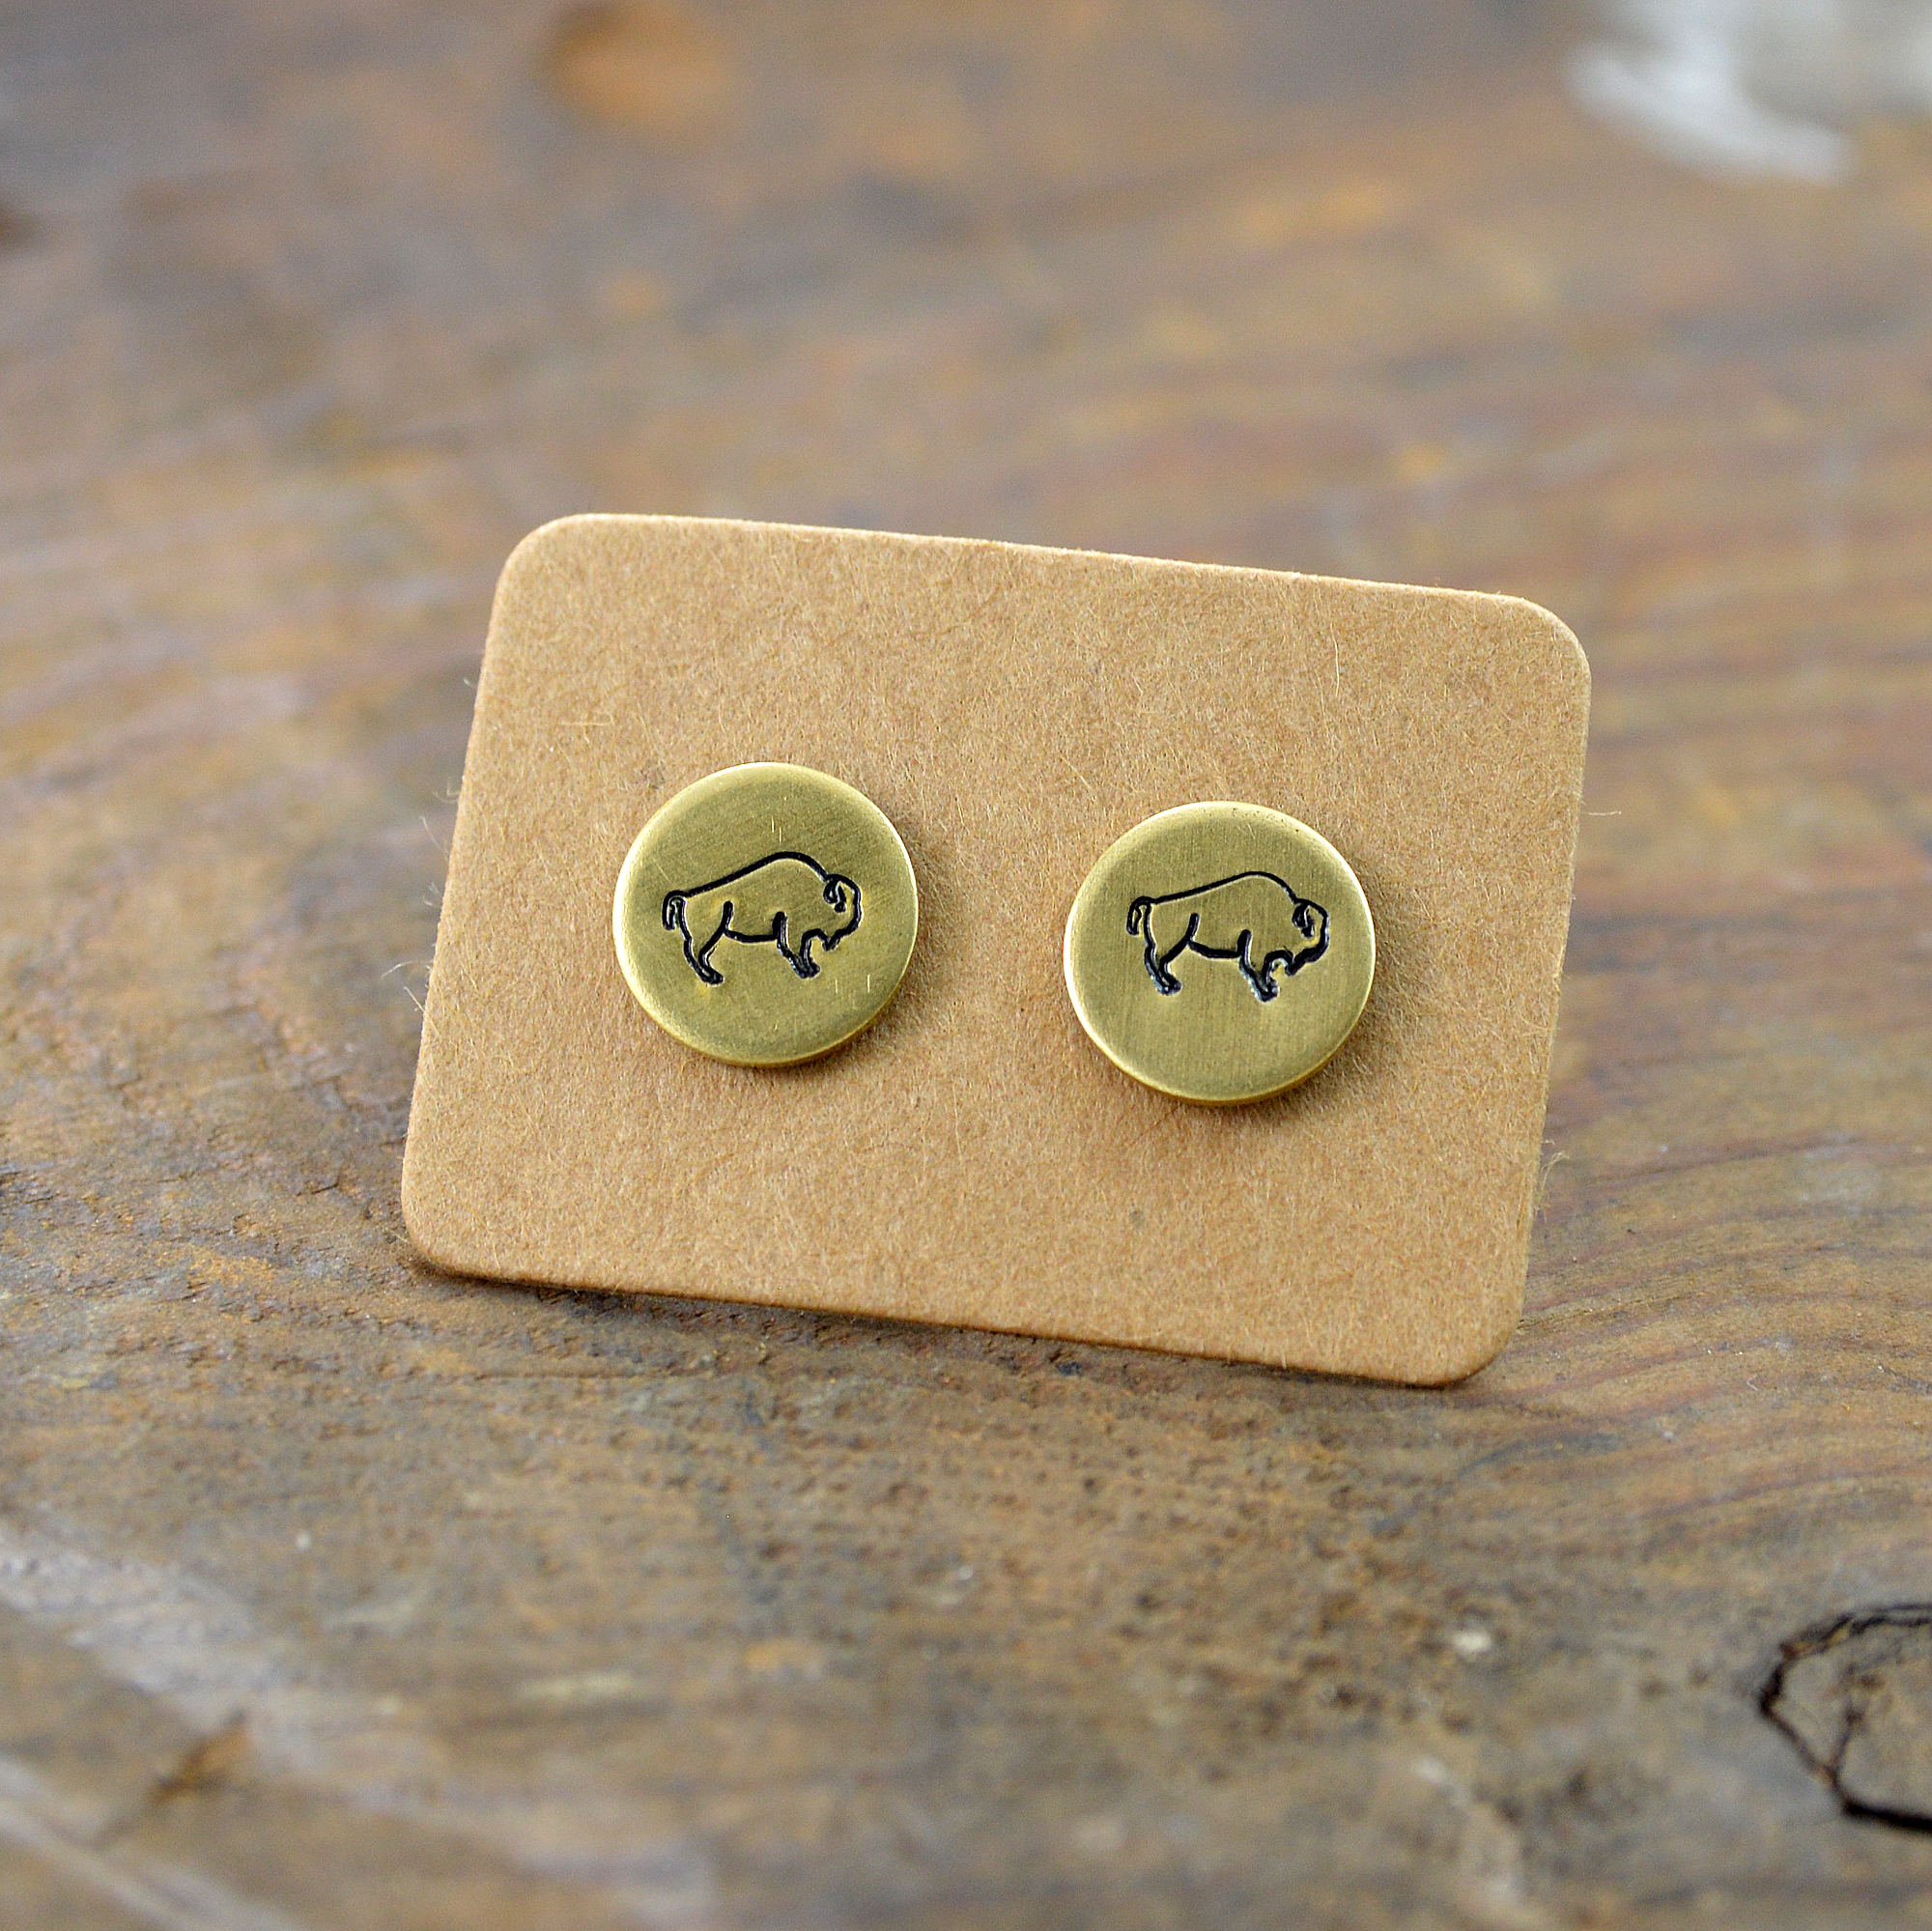 buffalo bison brass stud earrings made in buffalo ny gift ship